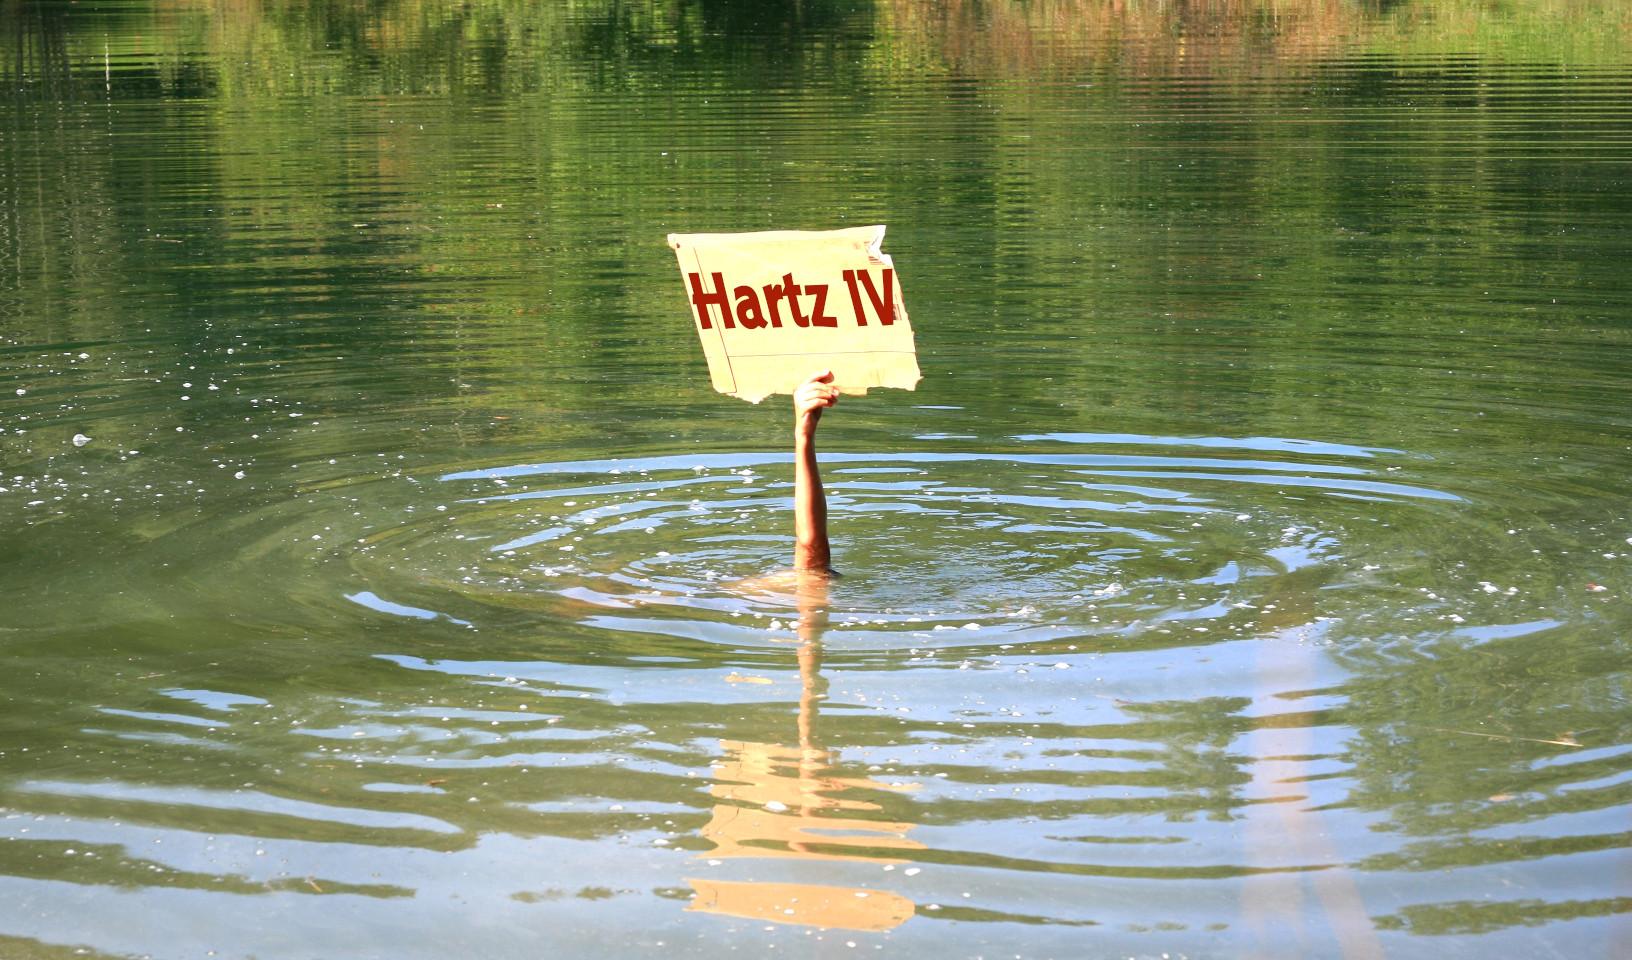 See - Untergang durch Hartz IV